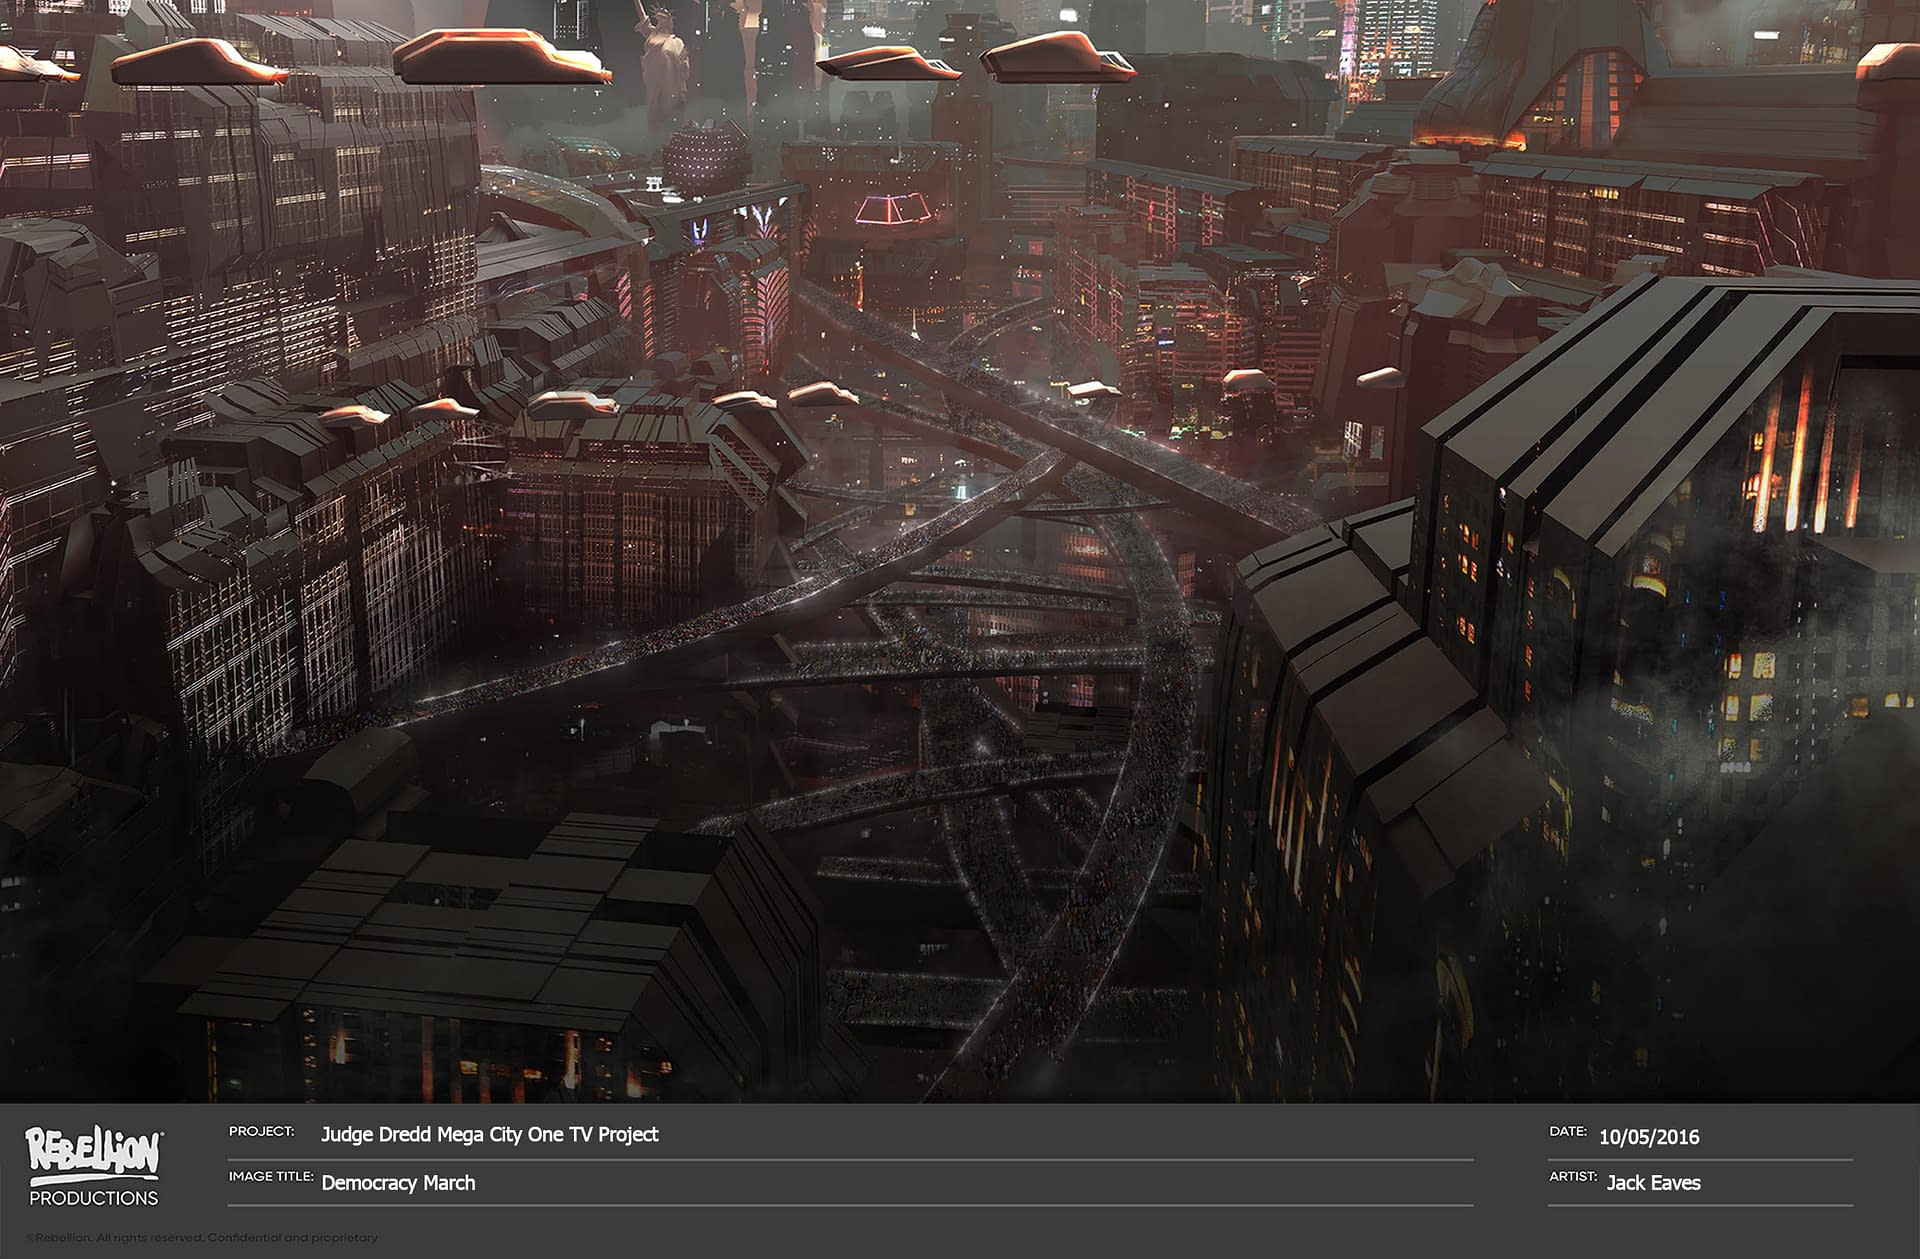 First Concept Art For Judge Dredd: Mega-City One